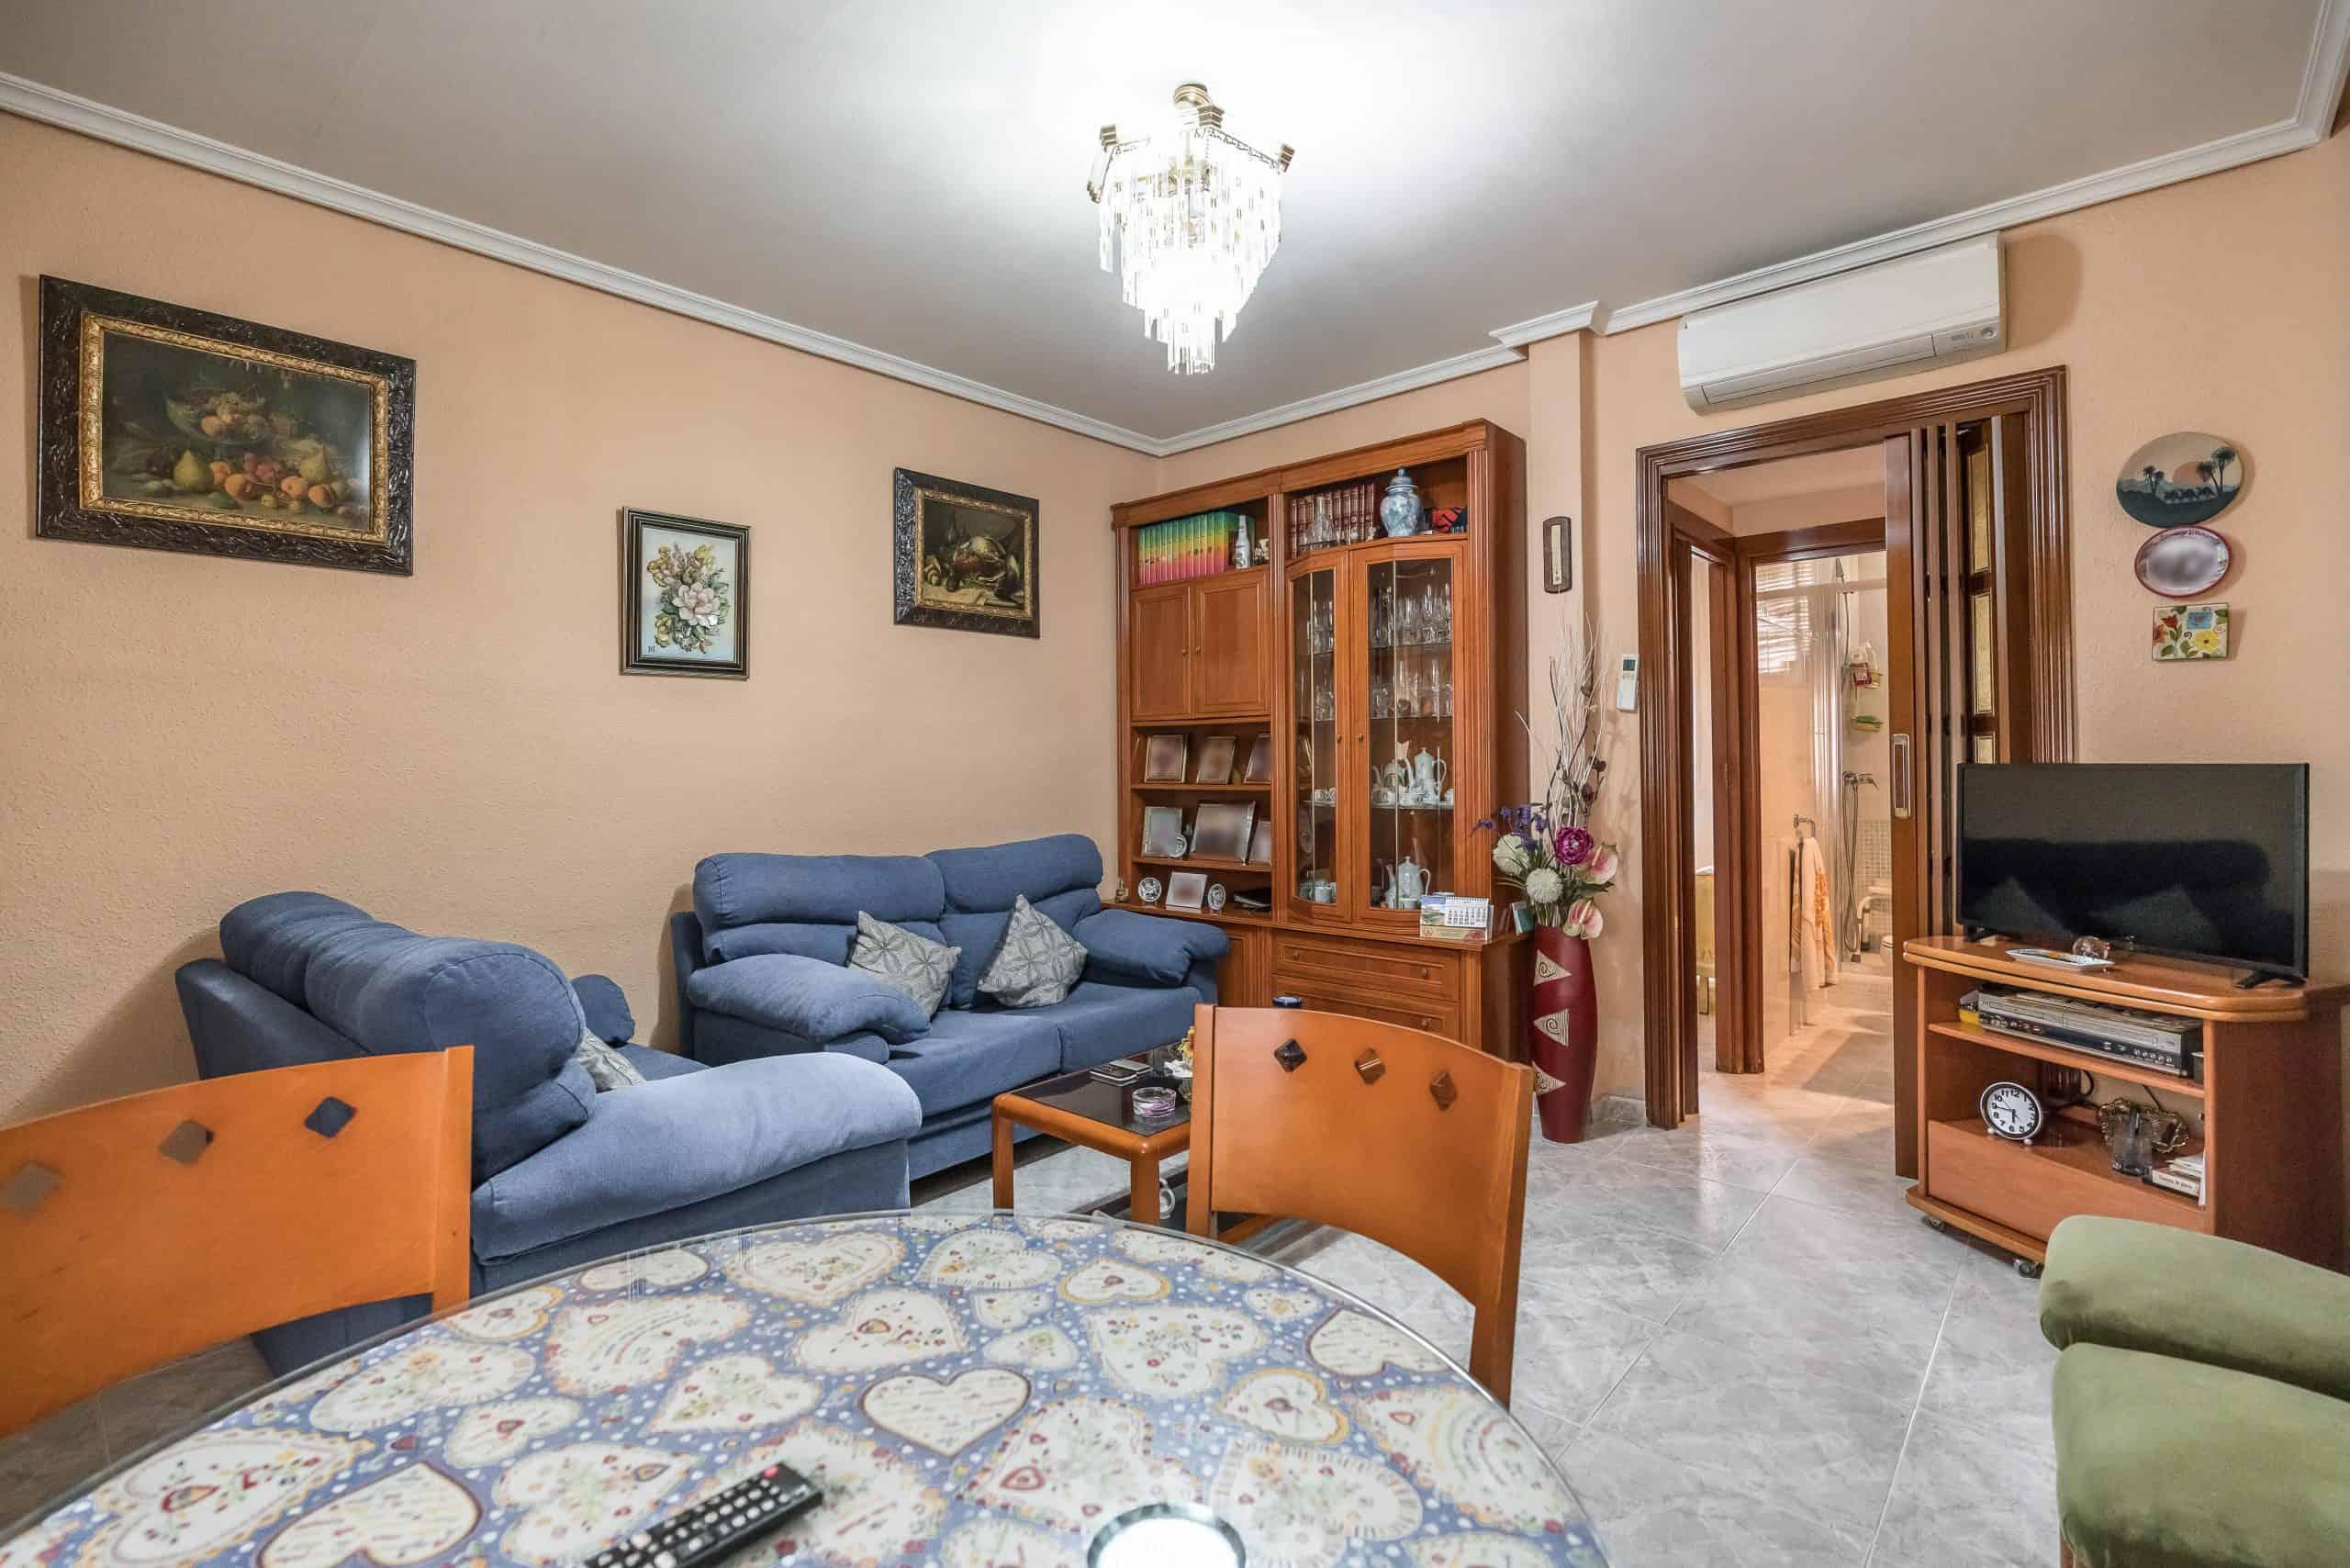 Agencia Inmobiliaria de Madrid-FUTUROCASA-Zona ARGANZUELA-EMBAJADORES-LEGAZPI1 SALON (8)